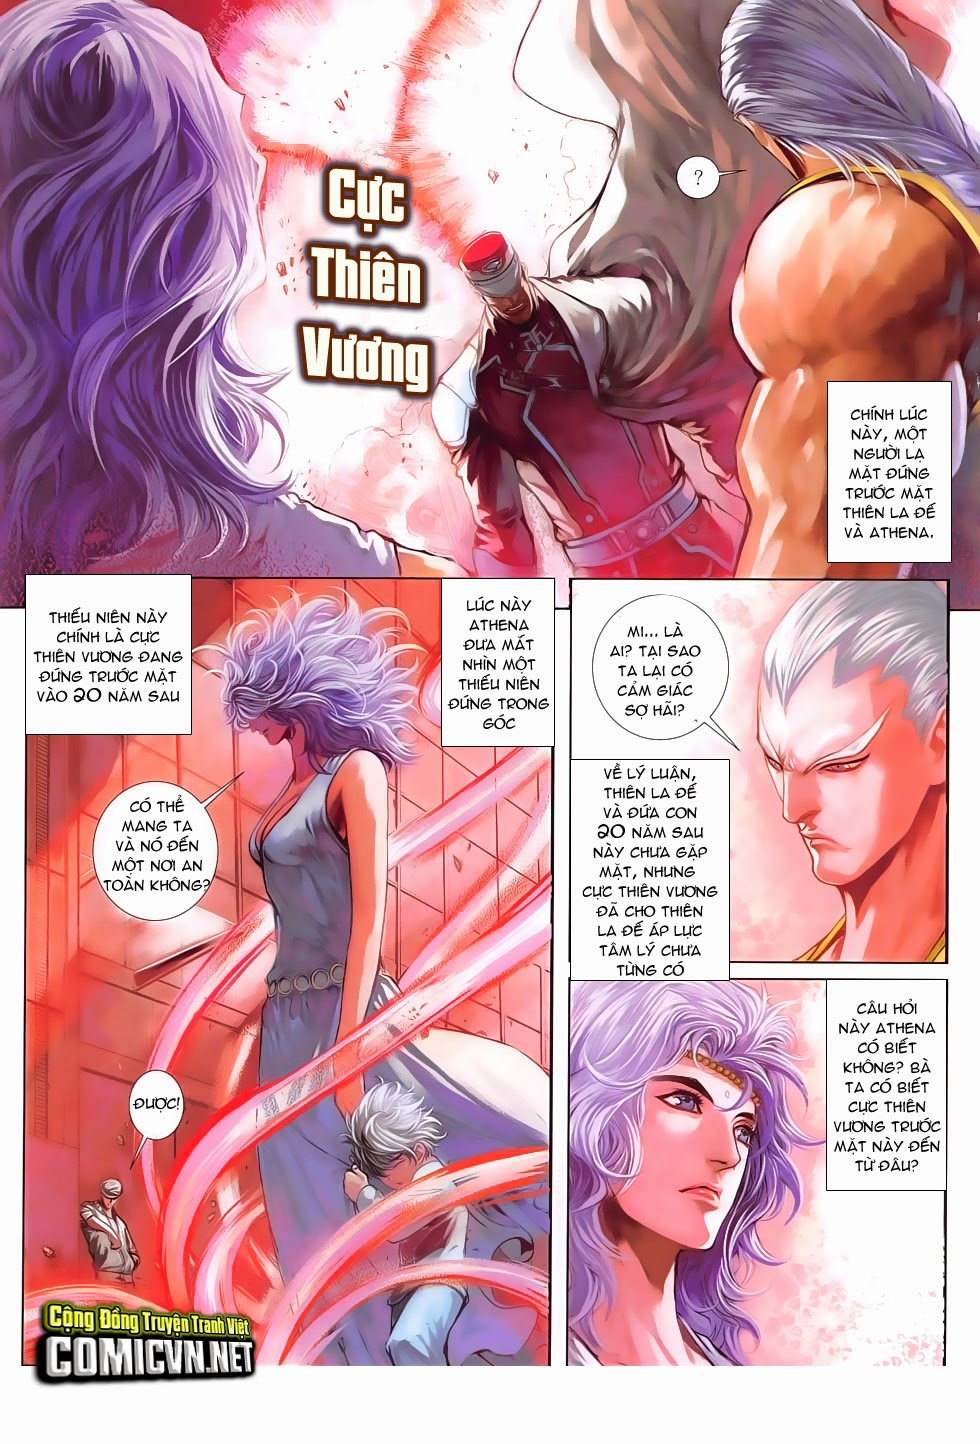 Ba Động Quyền Z Hadouken Zero chap 15 - Trang 13